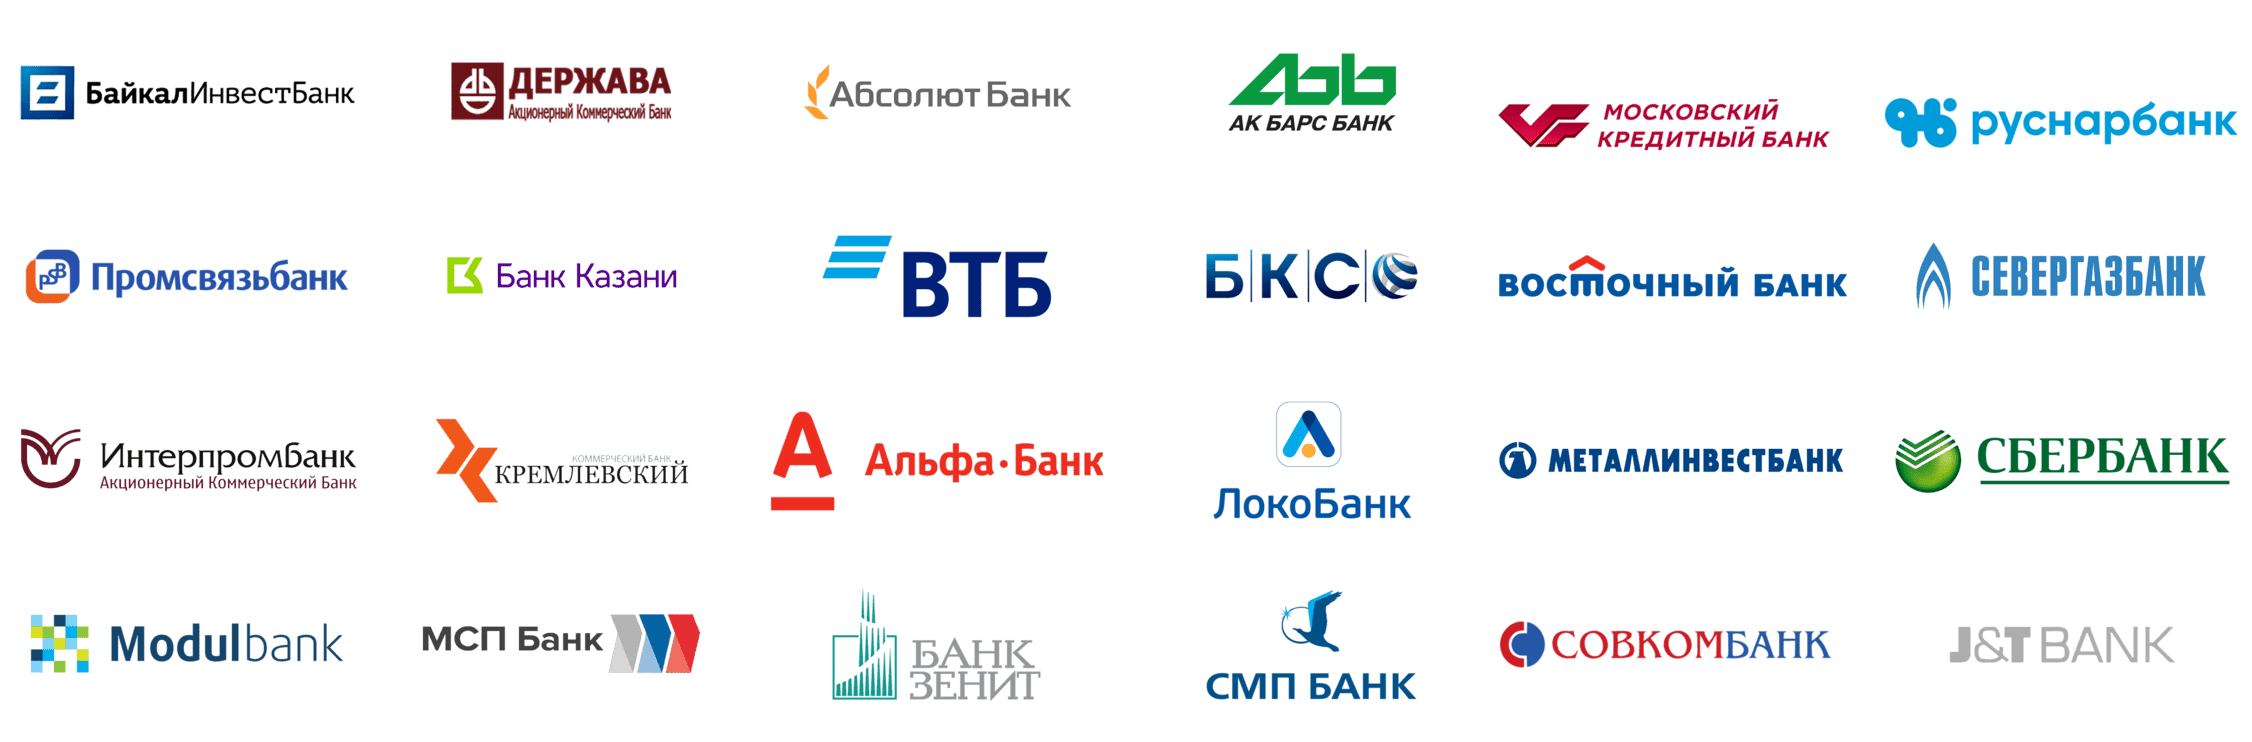 Банковская гарантия на обеспечение заявки 44-ФЗ